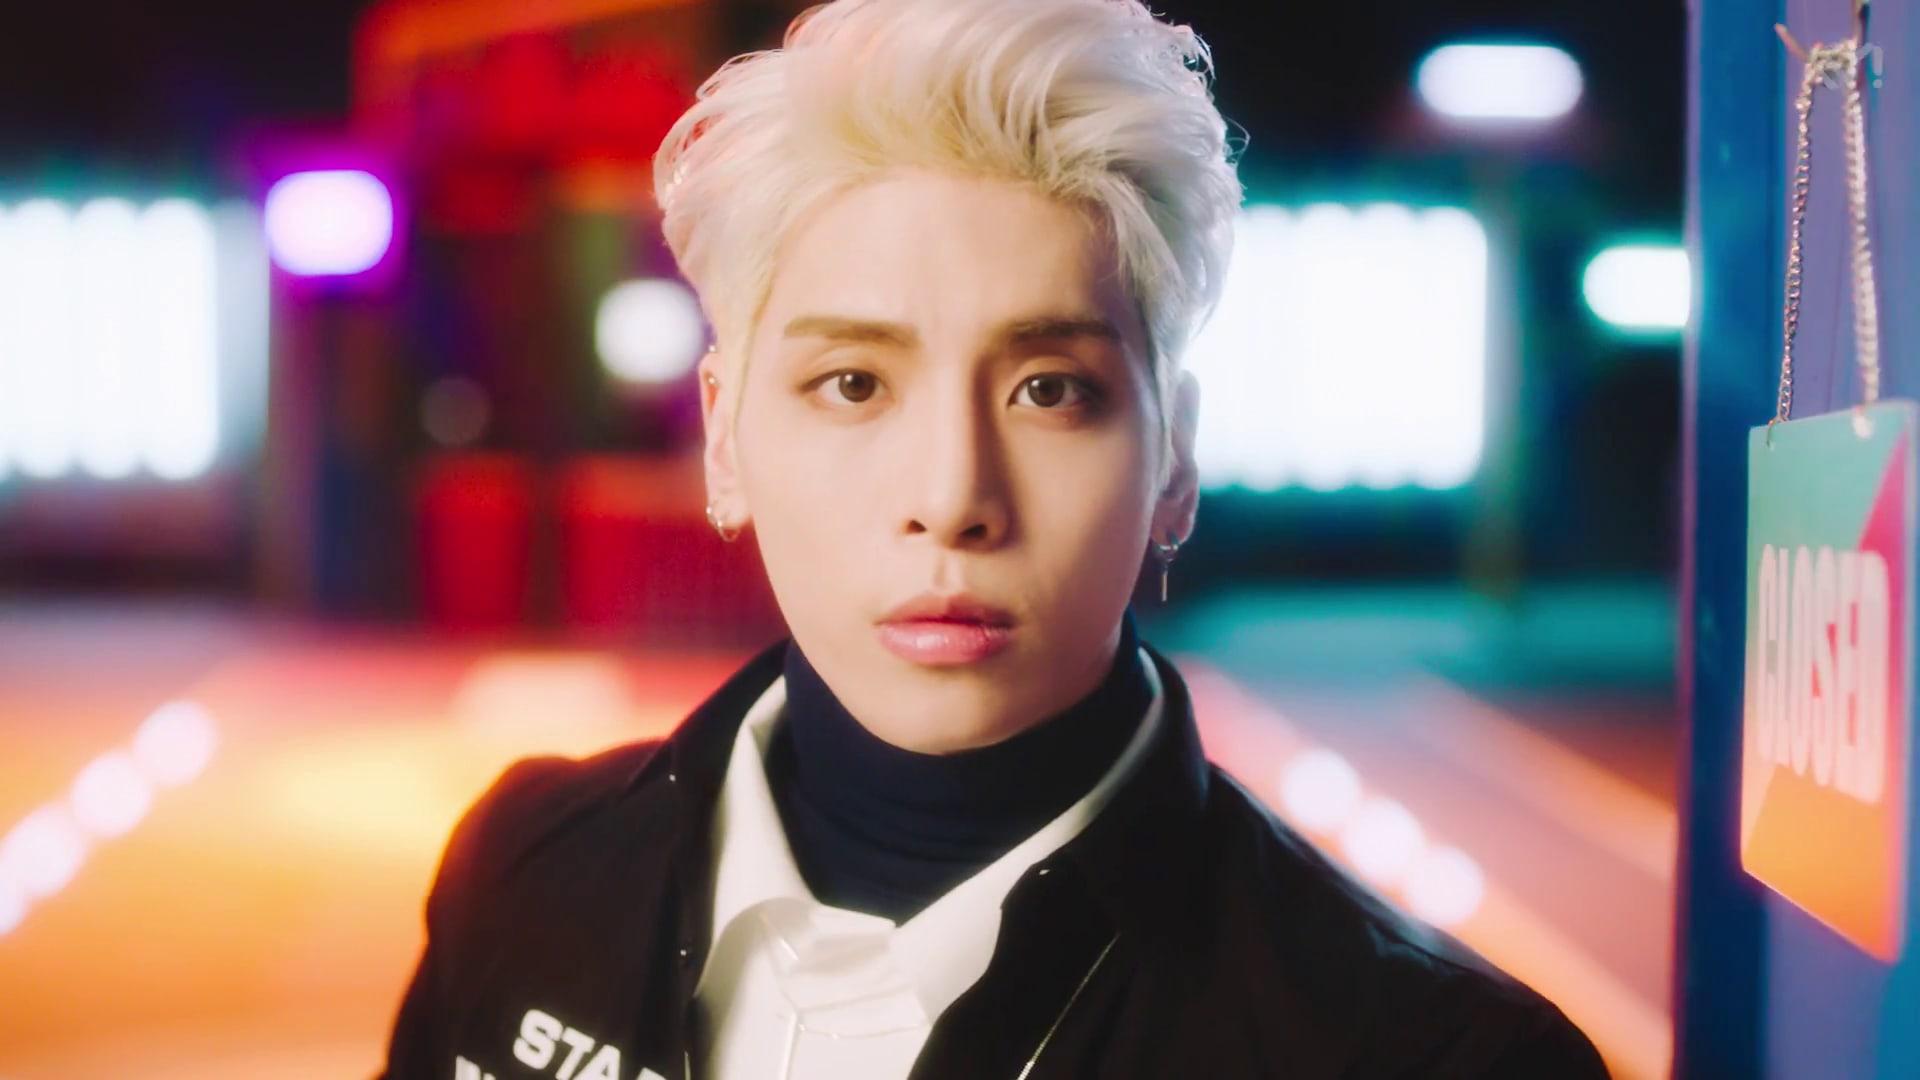 Watch: SHINee's Jonghyun Is Forever Shining In New MV